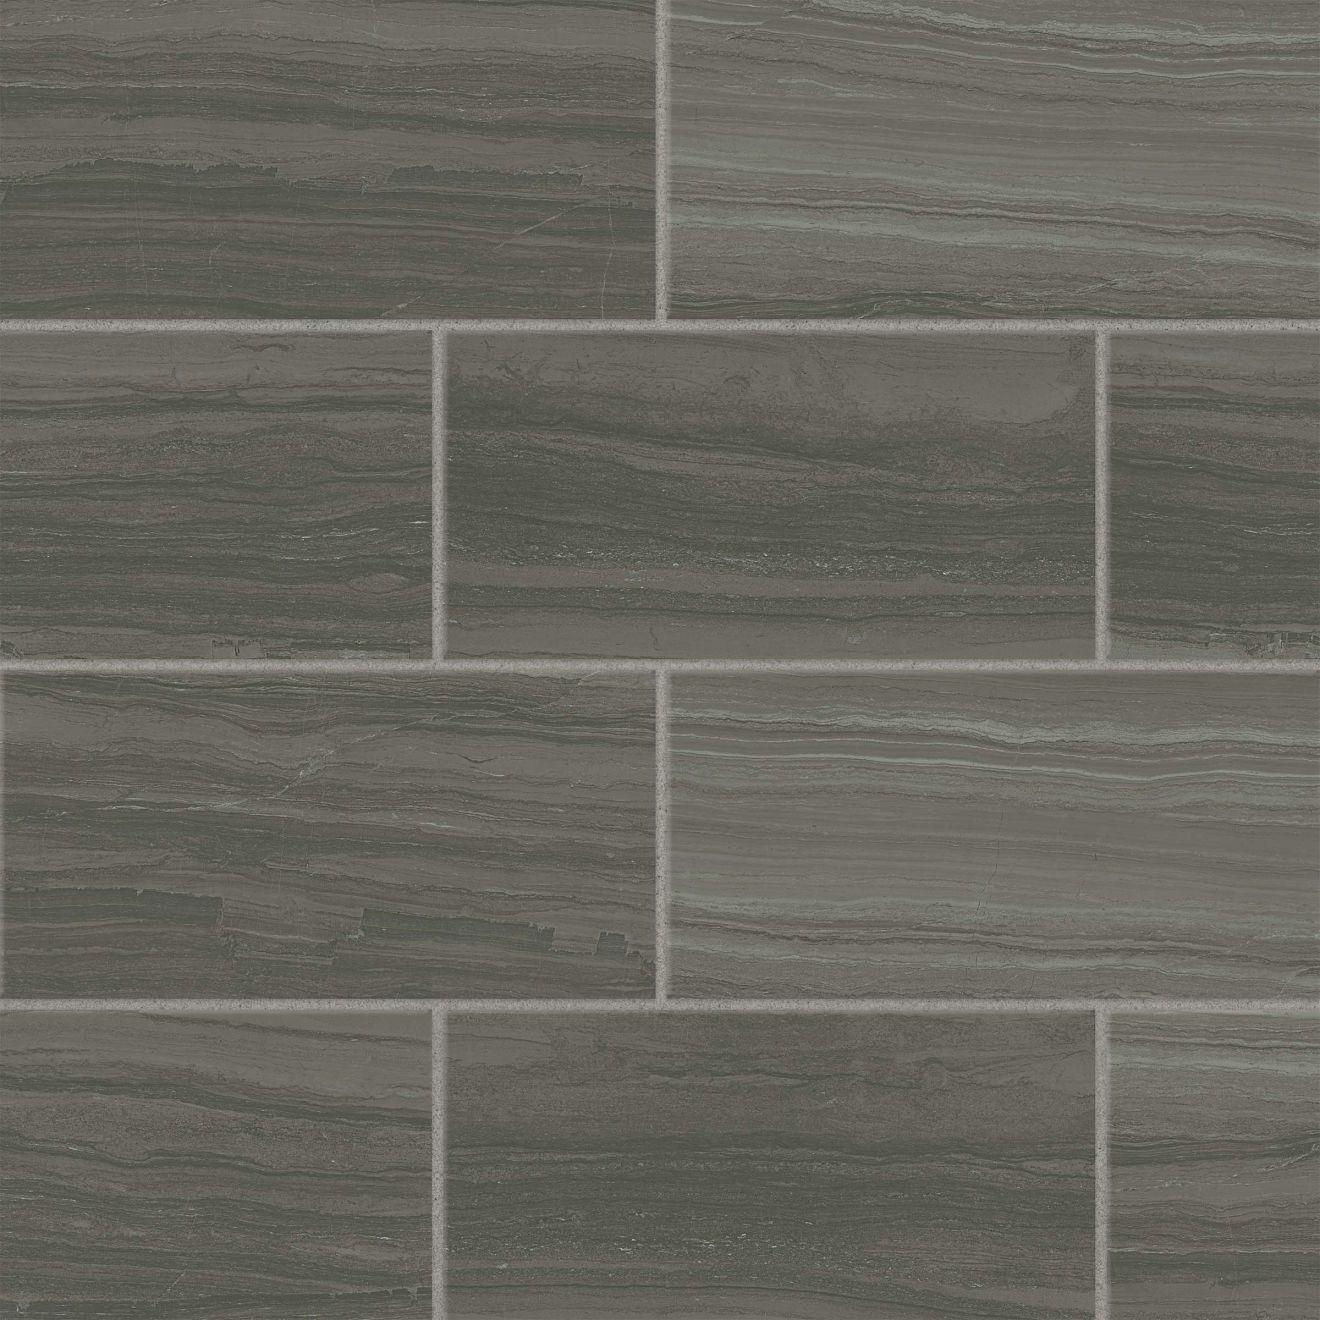 "Highland 12"" x 24"" Floor & Wall Tile in Dark Greige"